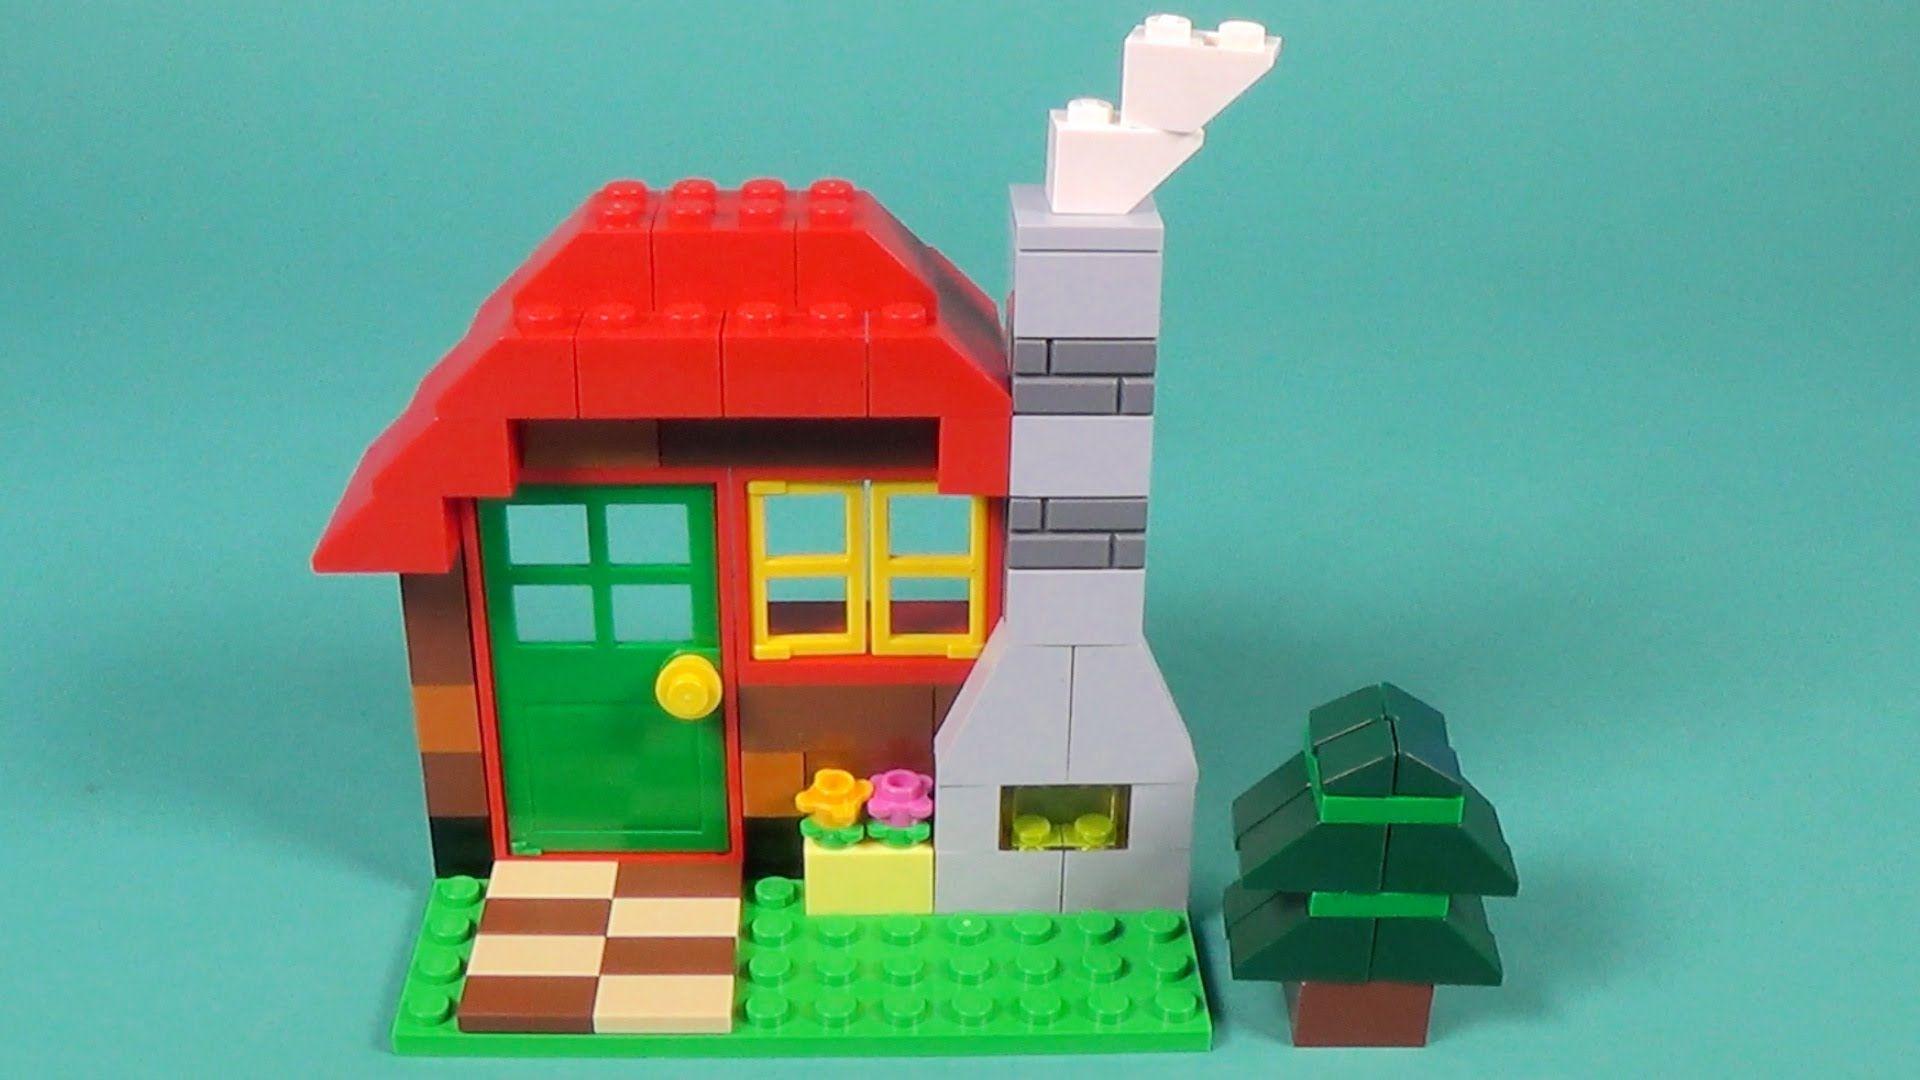 Lego Log Cabin Building Instructions Lego Classic 10695 How To Lego Classic Lego Craft Building Instructions